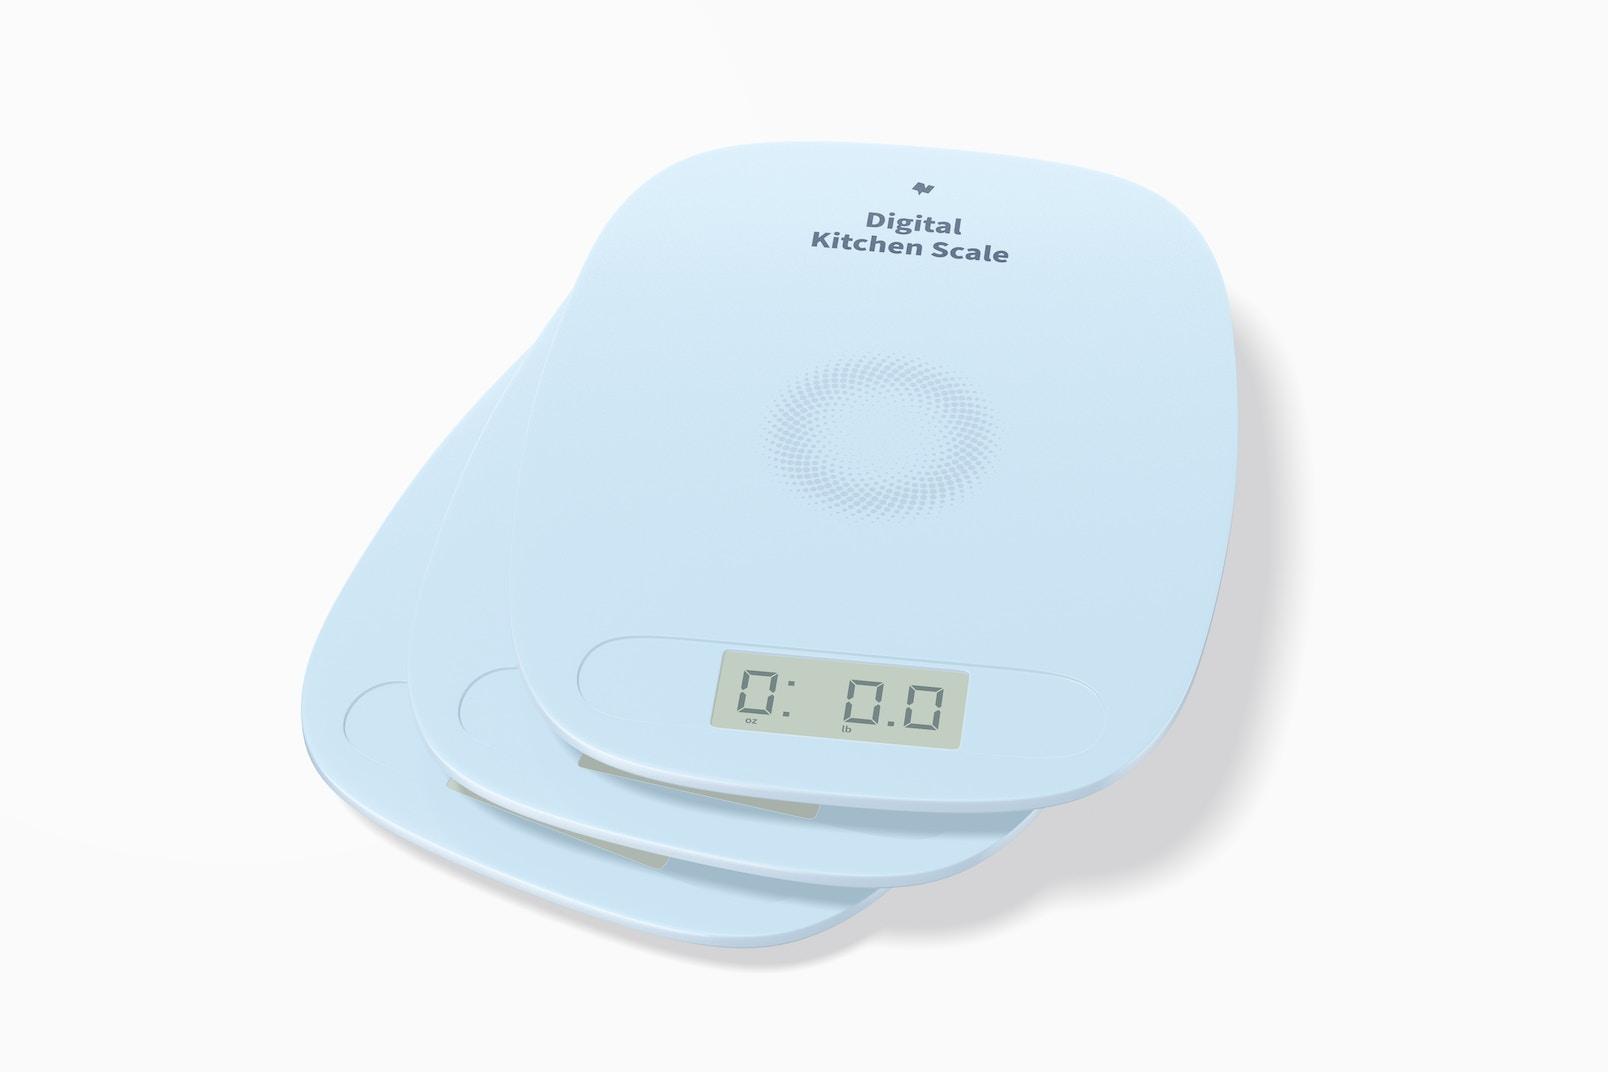 Digital Kitchen Scales Mockup